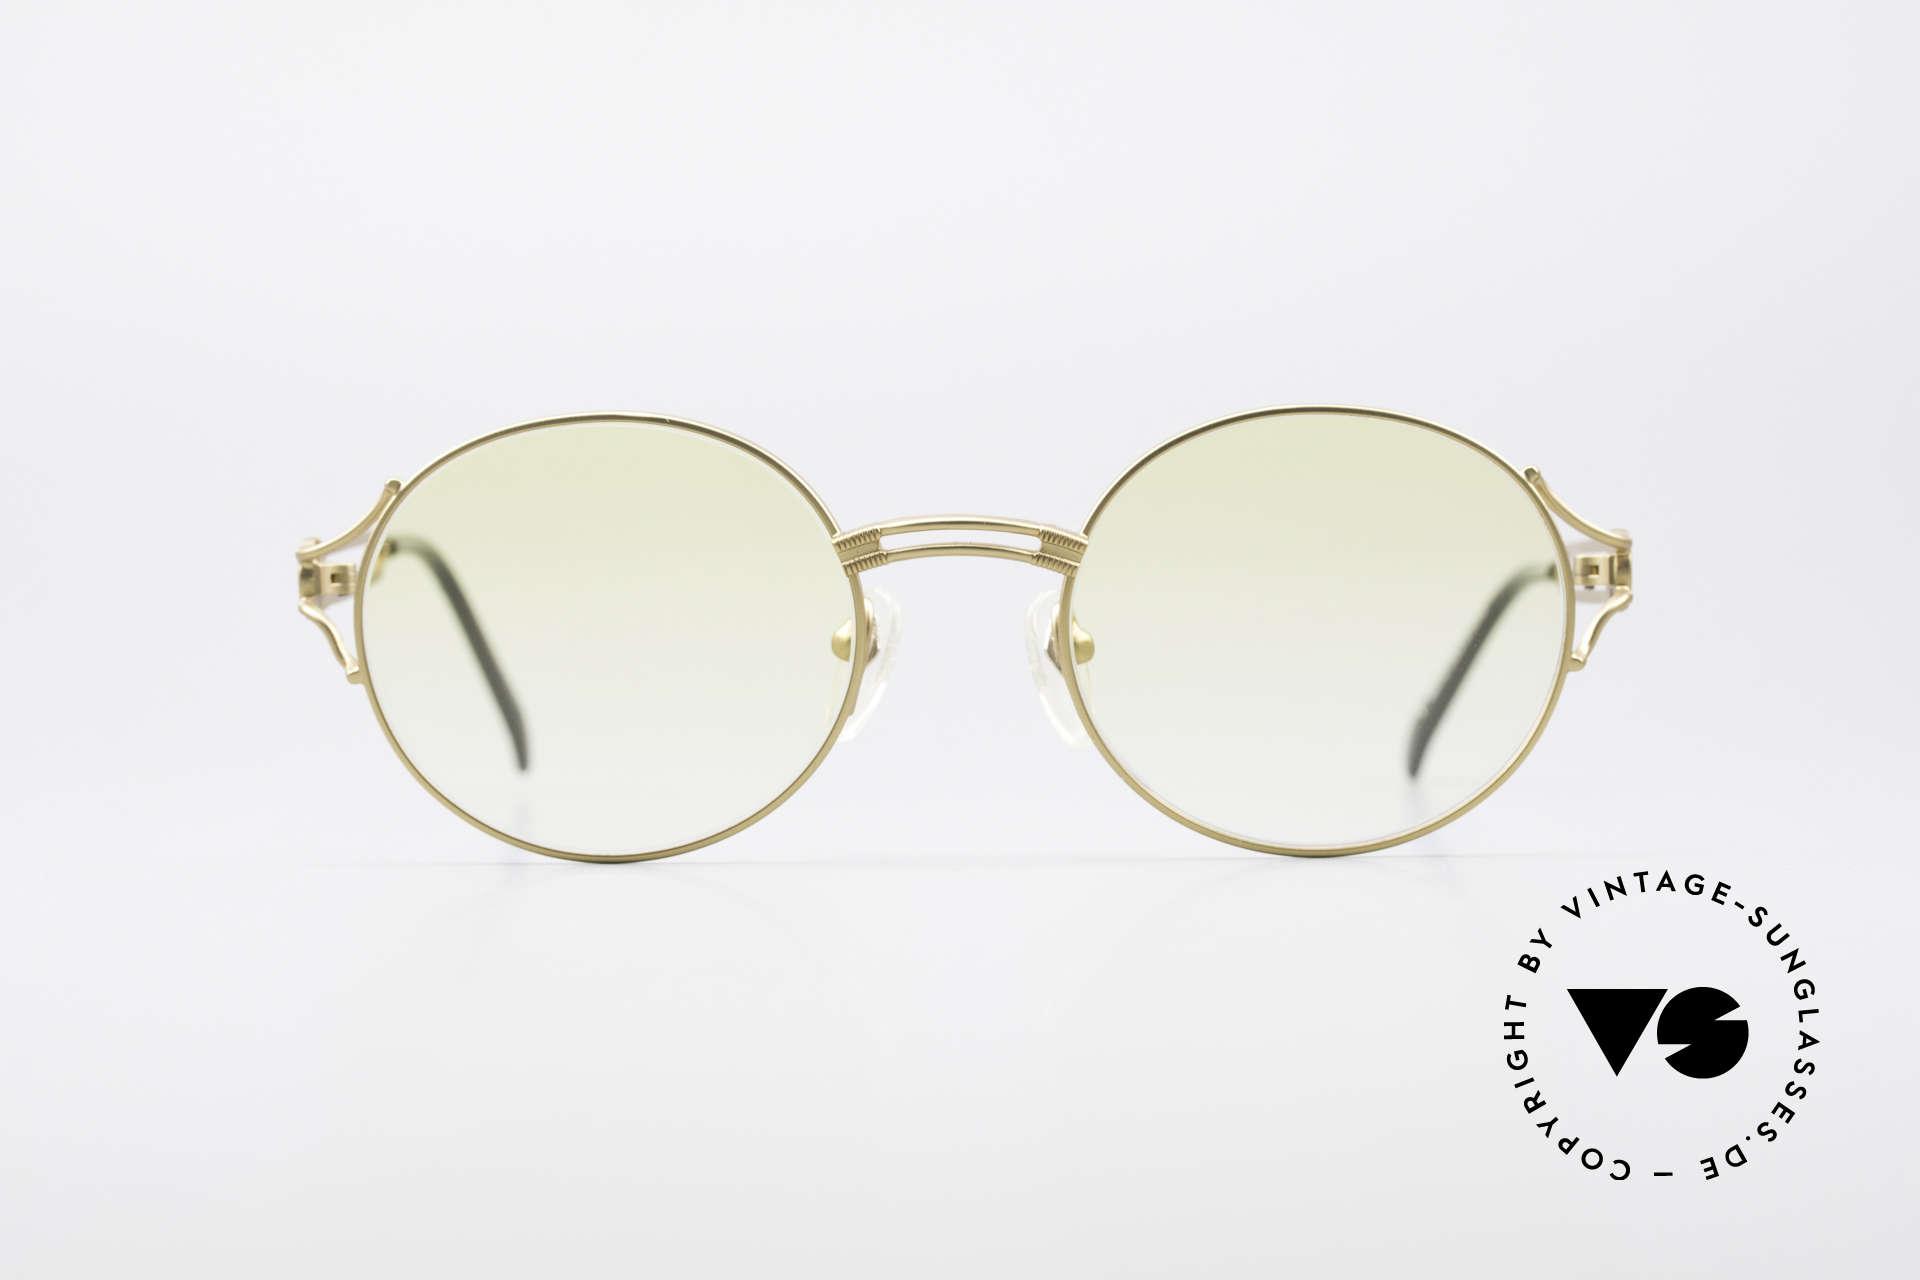 Tupac Jean 6102 On Gaultier Me Paul Eyez Glasses 57 All 7YgvIb6fy